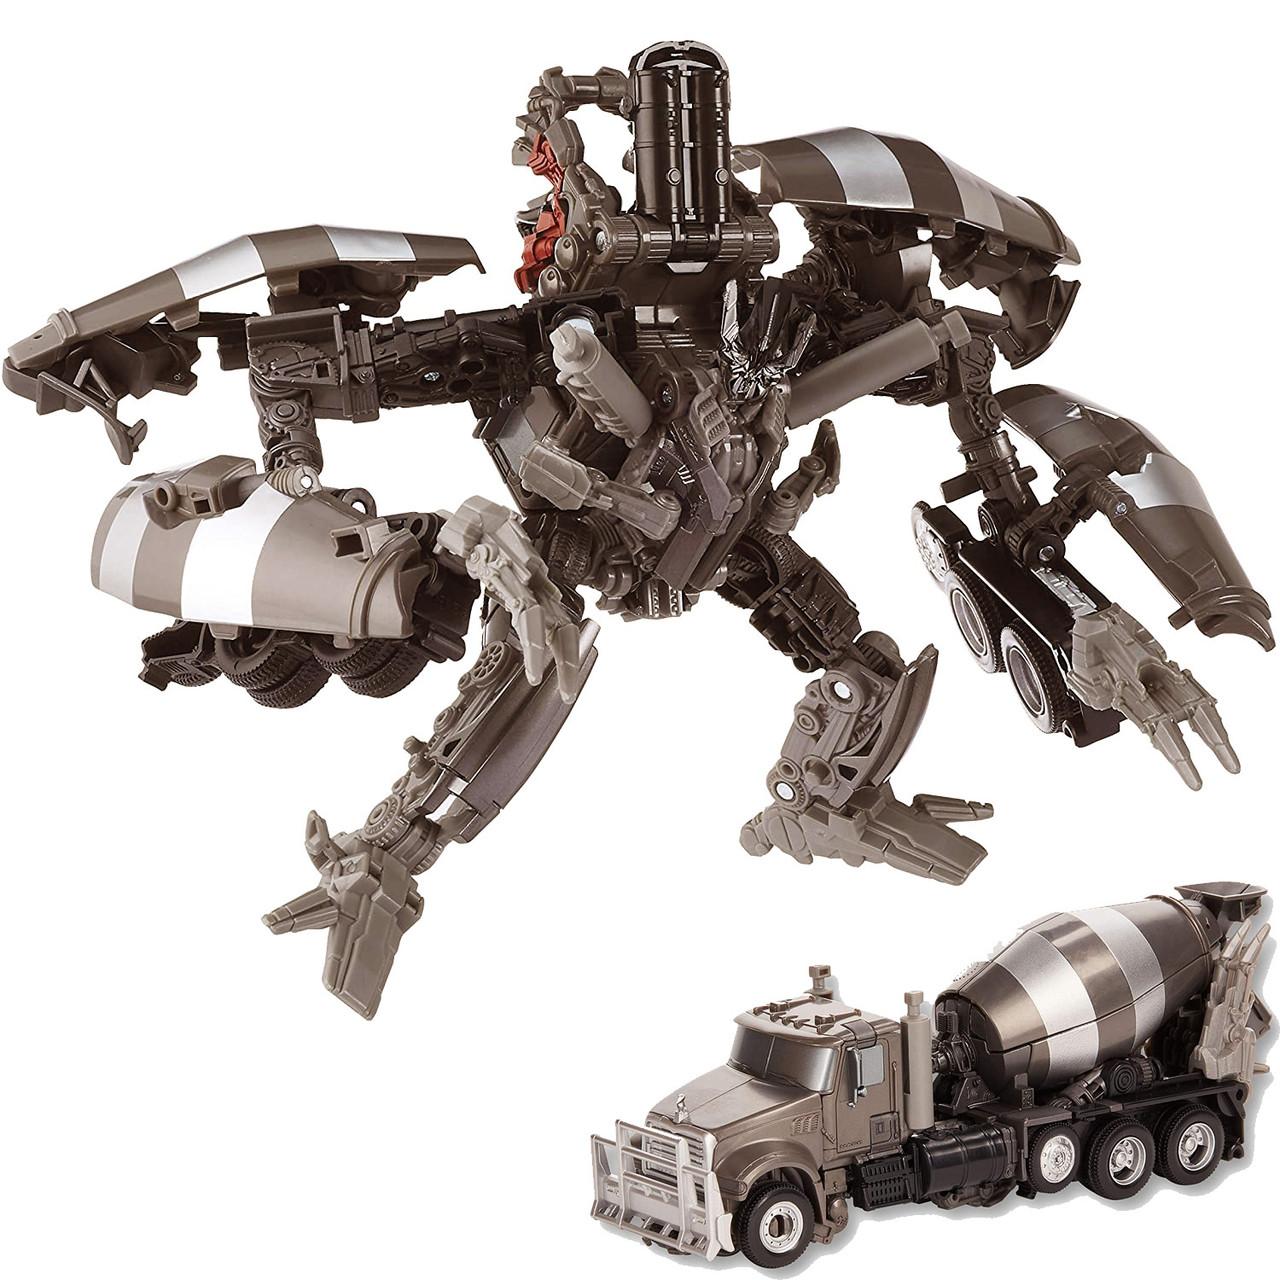 Трансформер Студіо Серія 49 Бамблбі Transformers Studio Series 49 Bumblebee